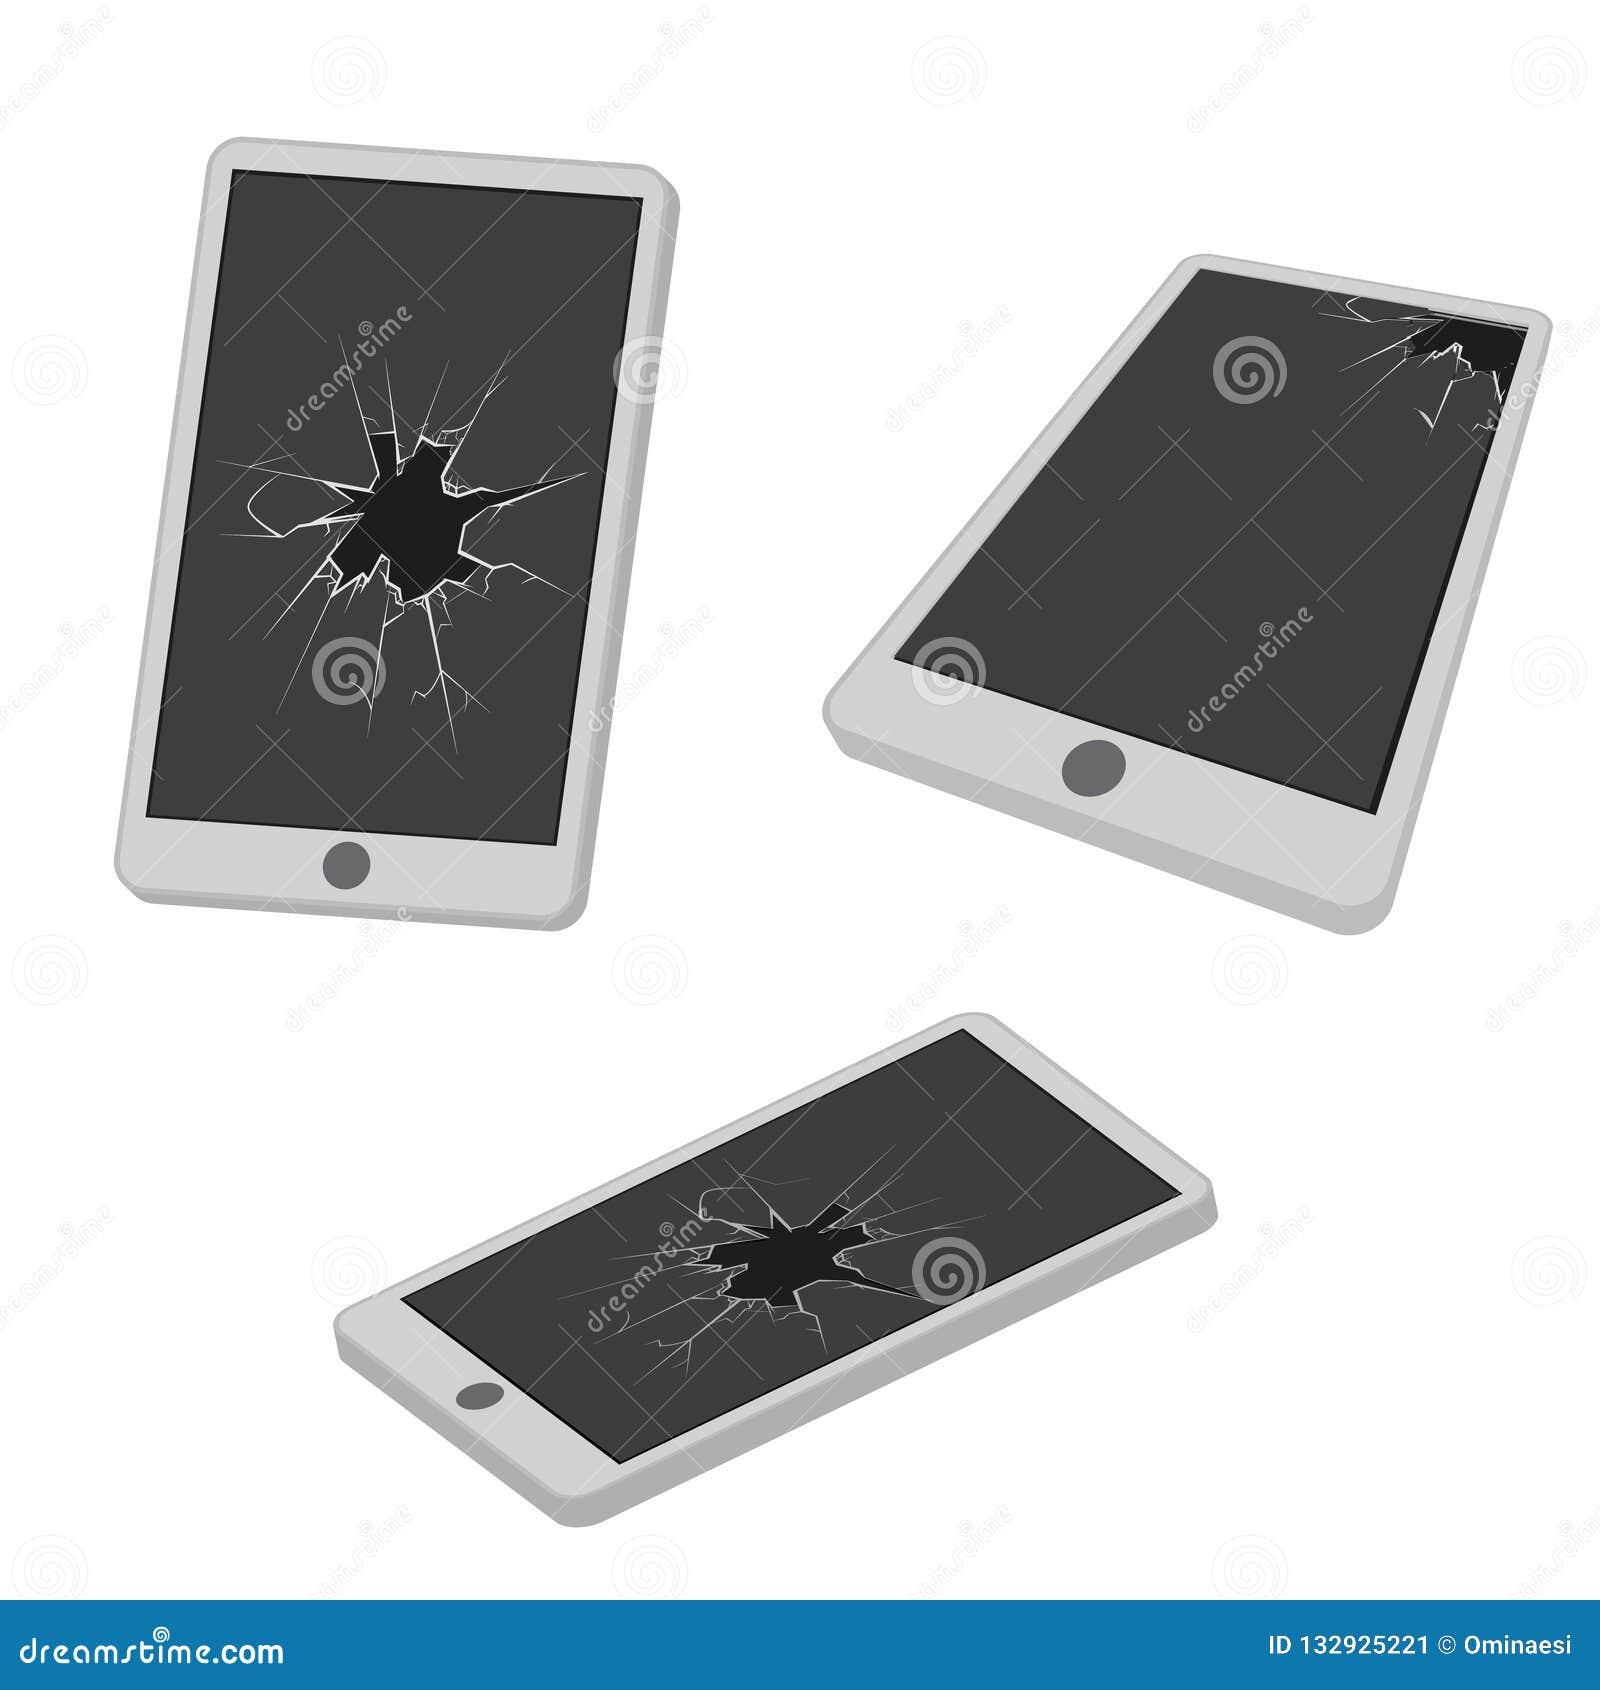 Glass hole cracks broken mobile phone electronic garbage realistic isometric design icon vector illustration